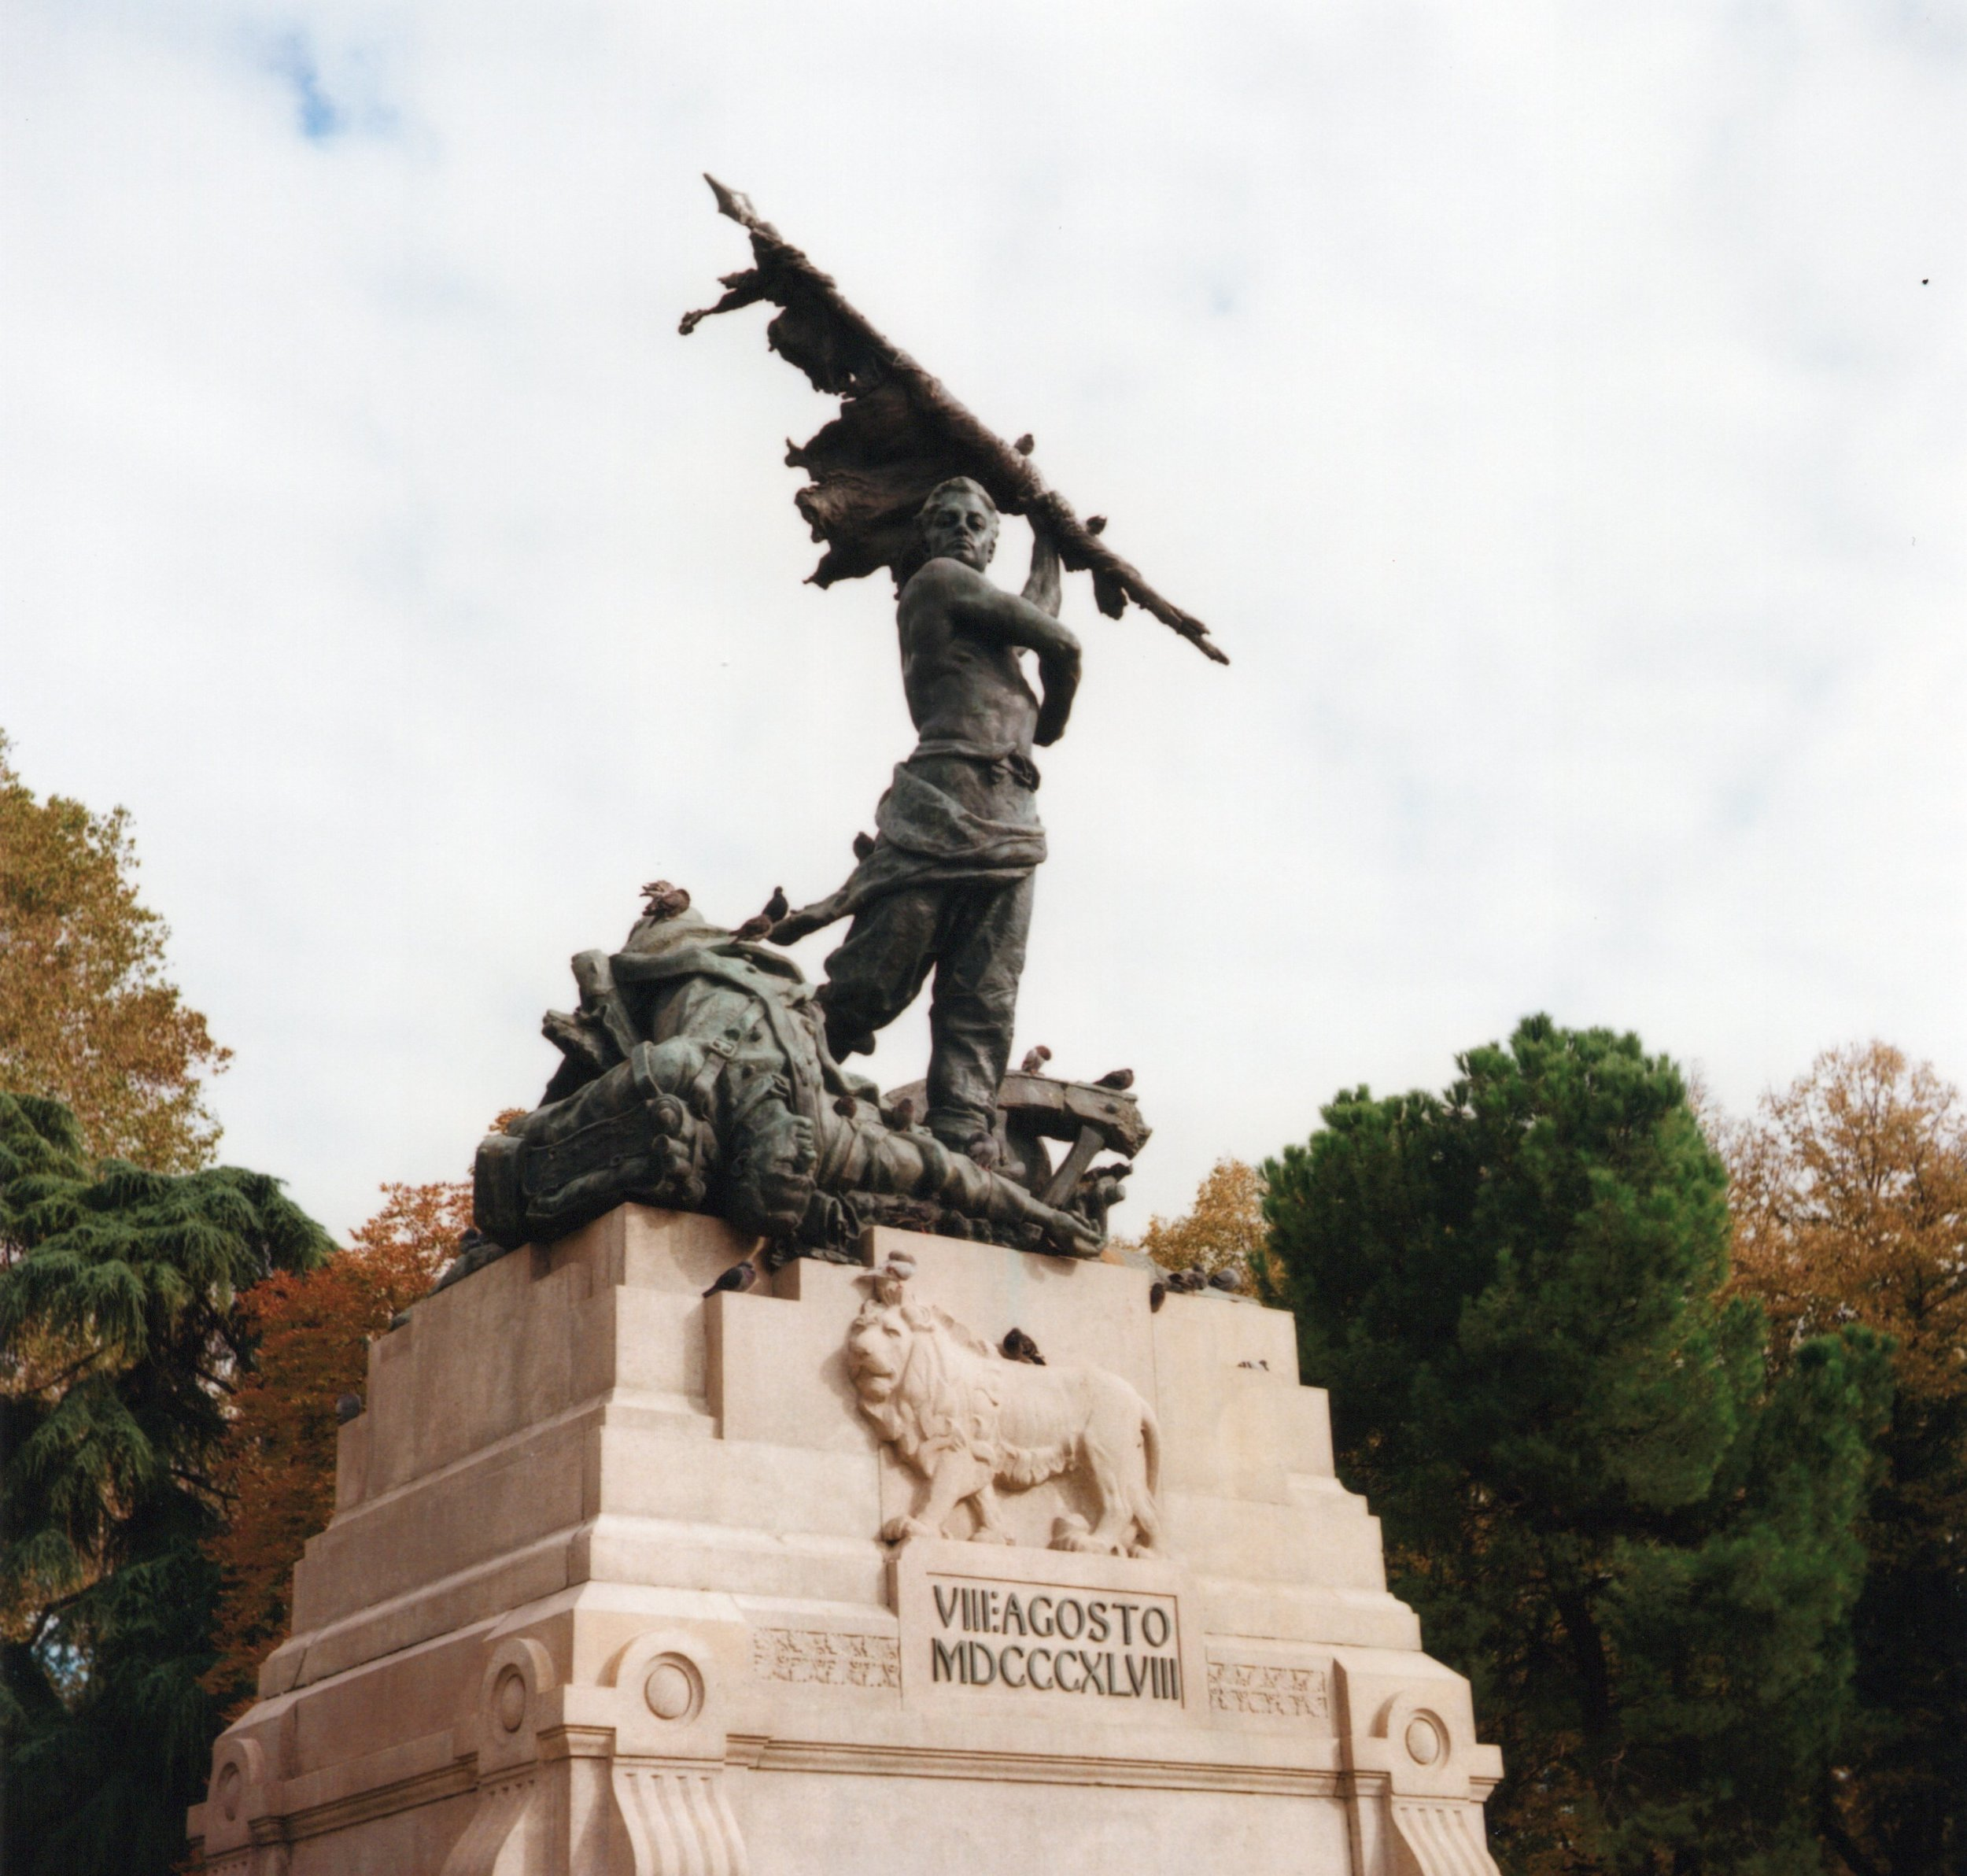 statue 3 f8 125th sec.jpg